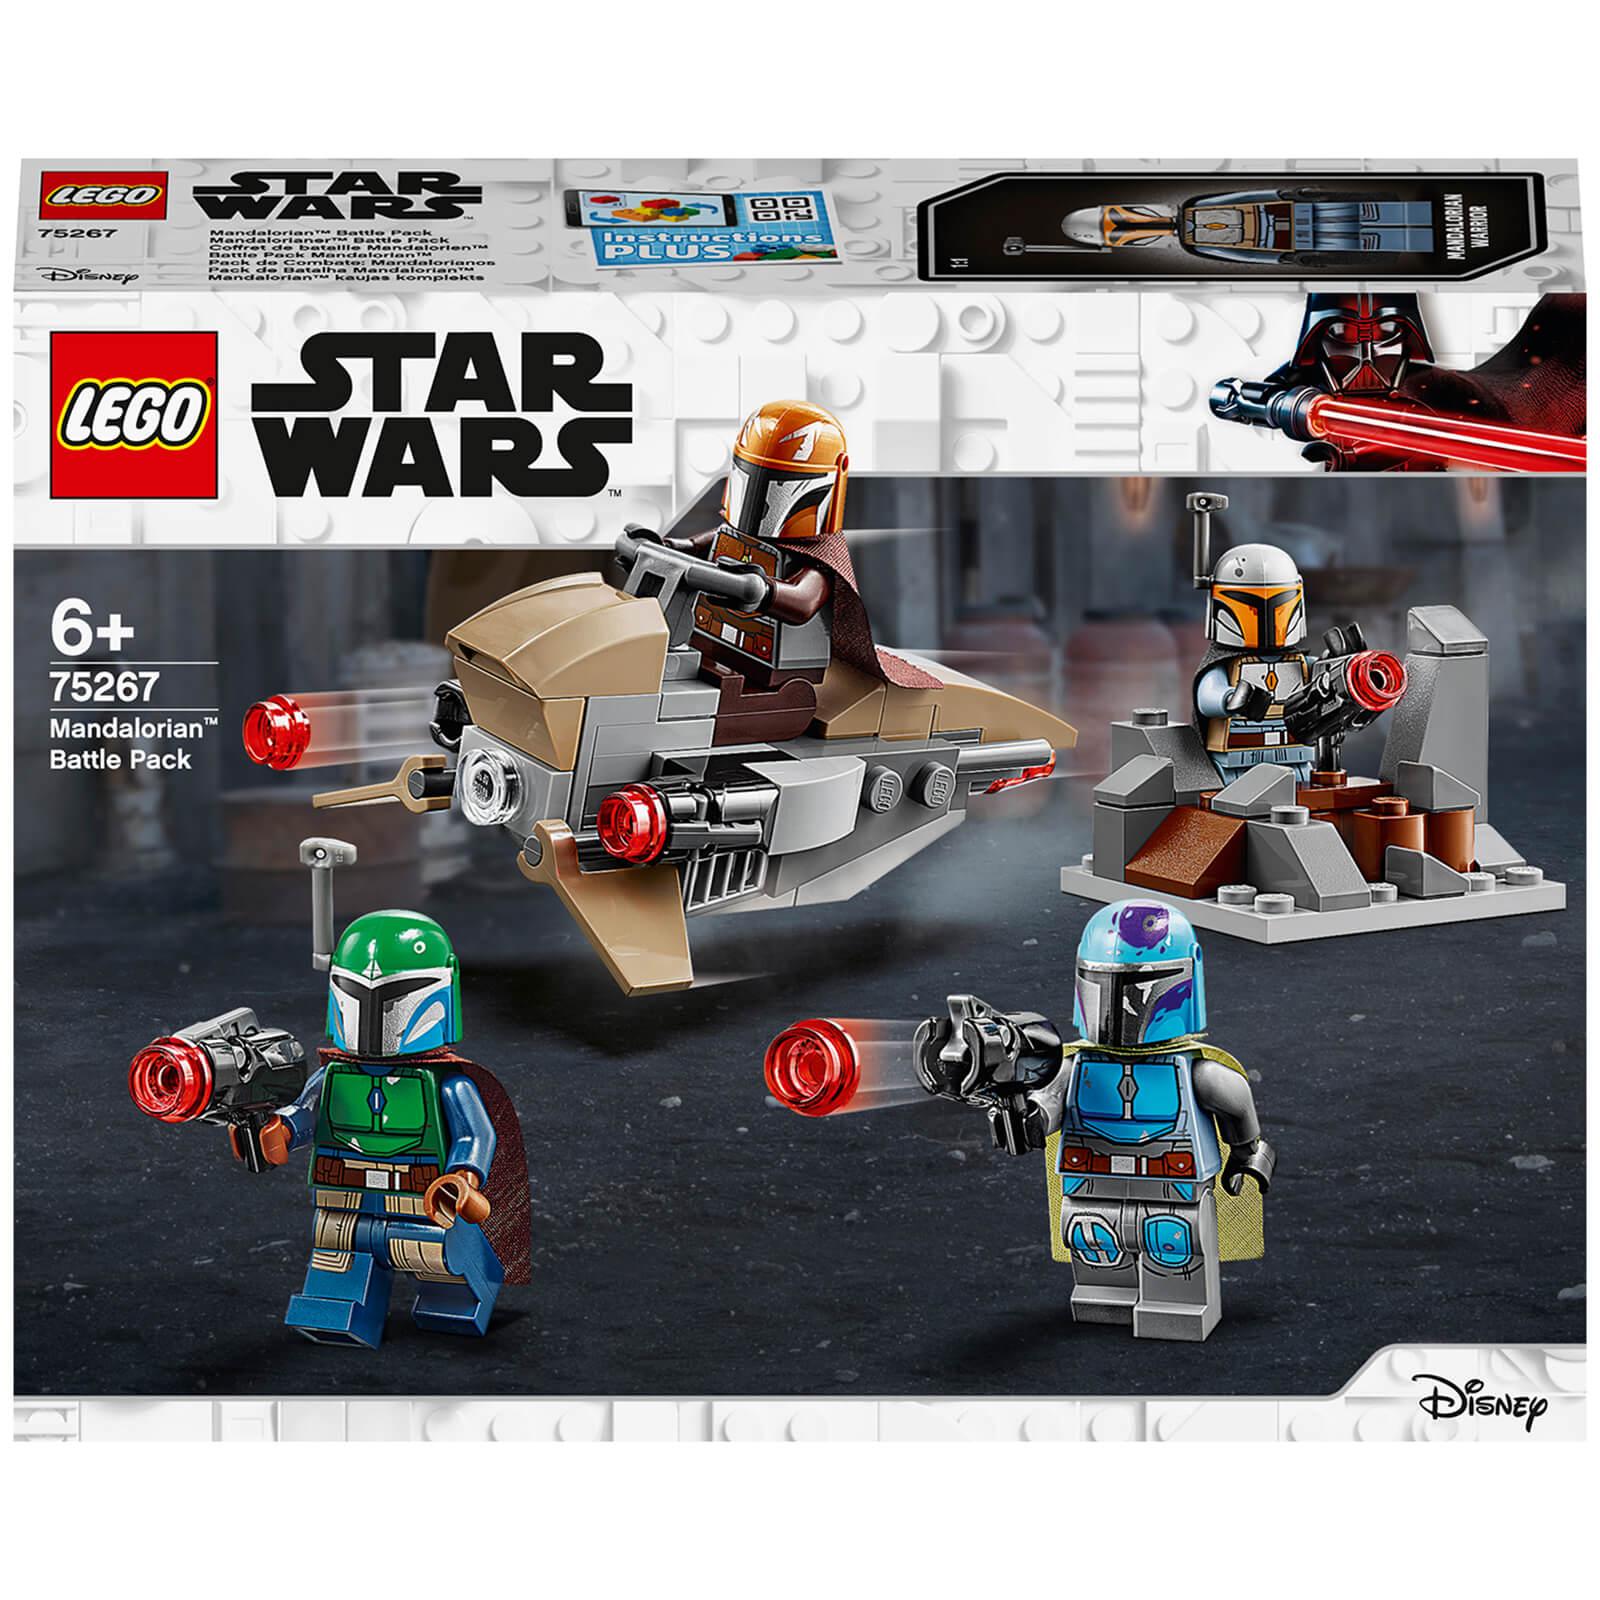 Image of LEGO Star Wars: Mandalorian Battle Pack Building Set (75267)